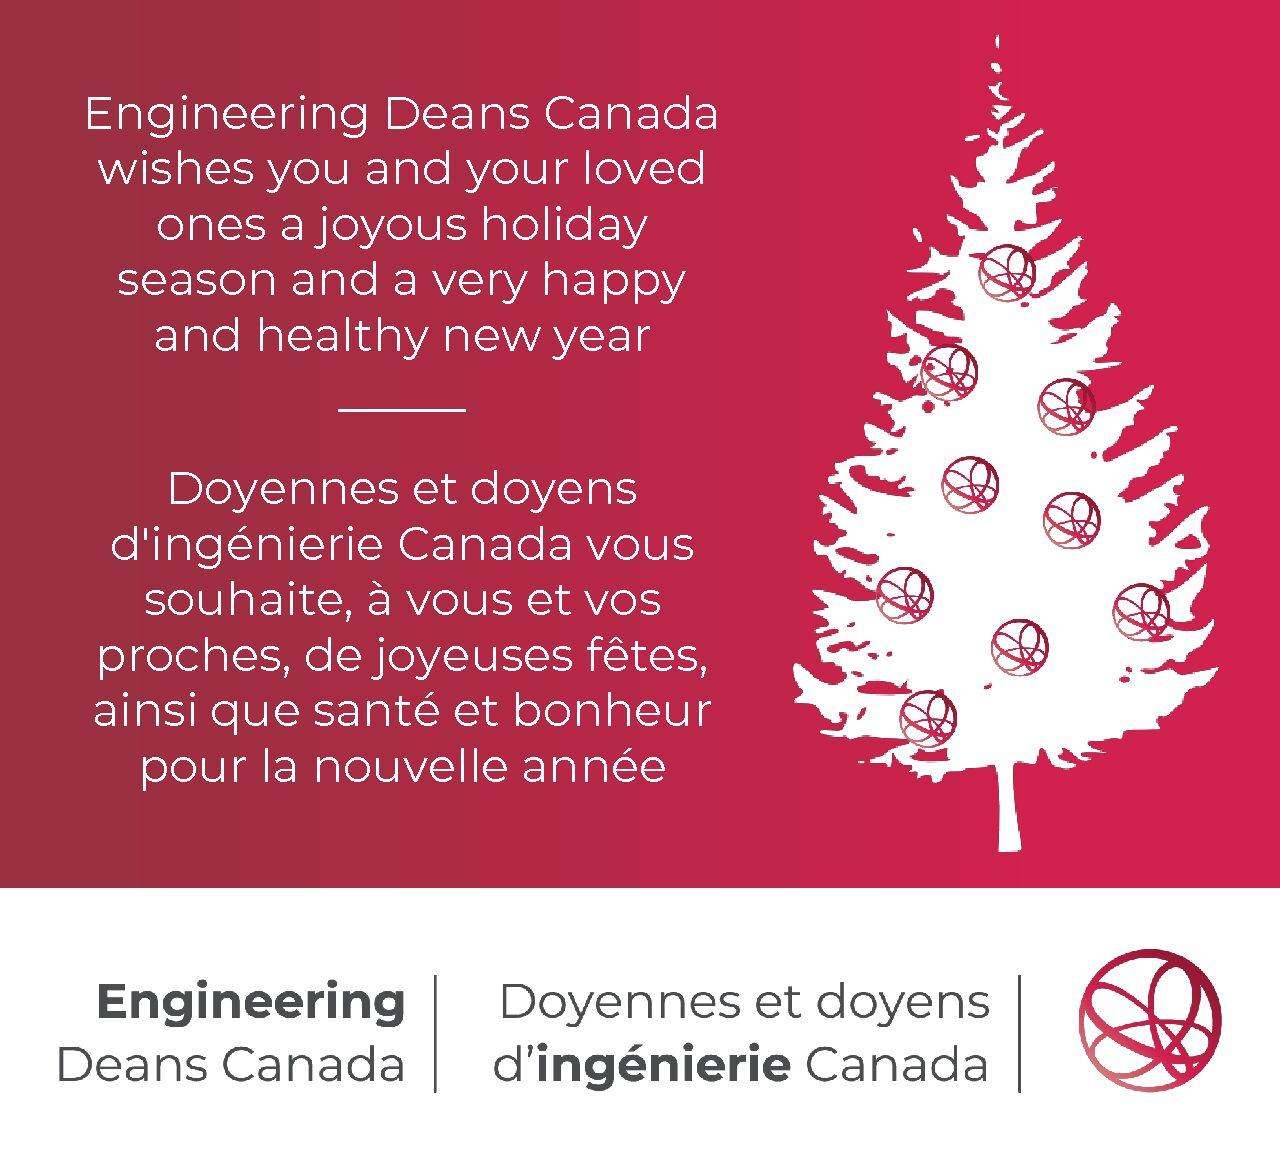 Happy holidays from Engineering Deans Canada! | Meilleurs vœux de Doyennes et doyen d'ingénierie Canada!